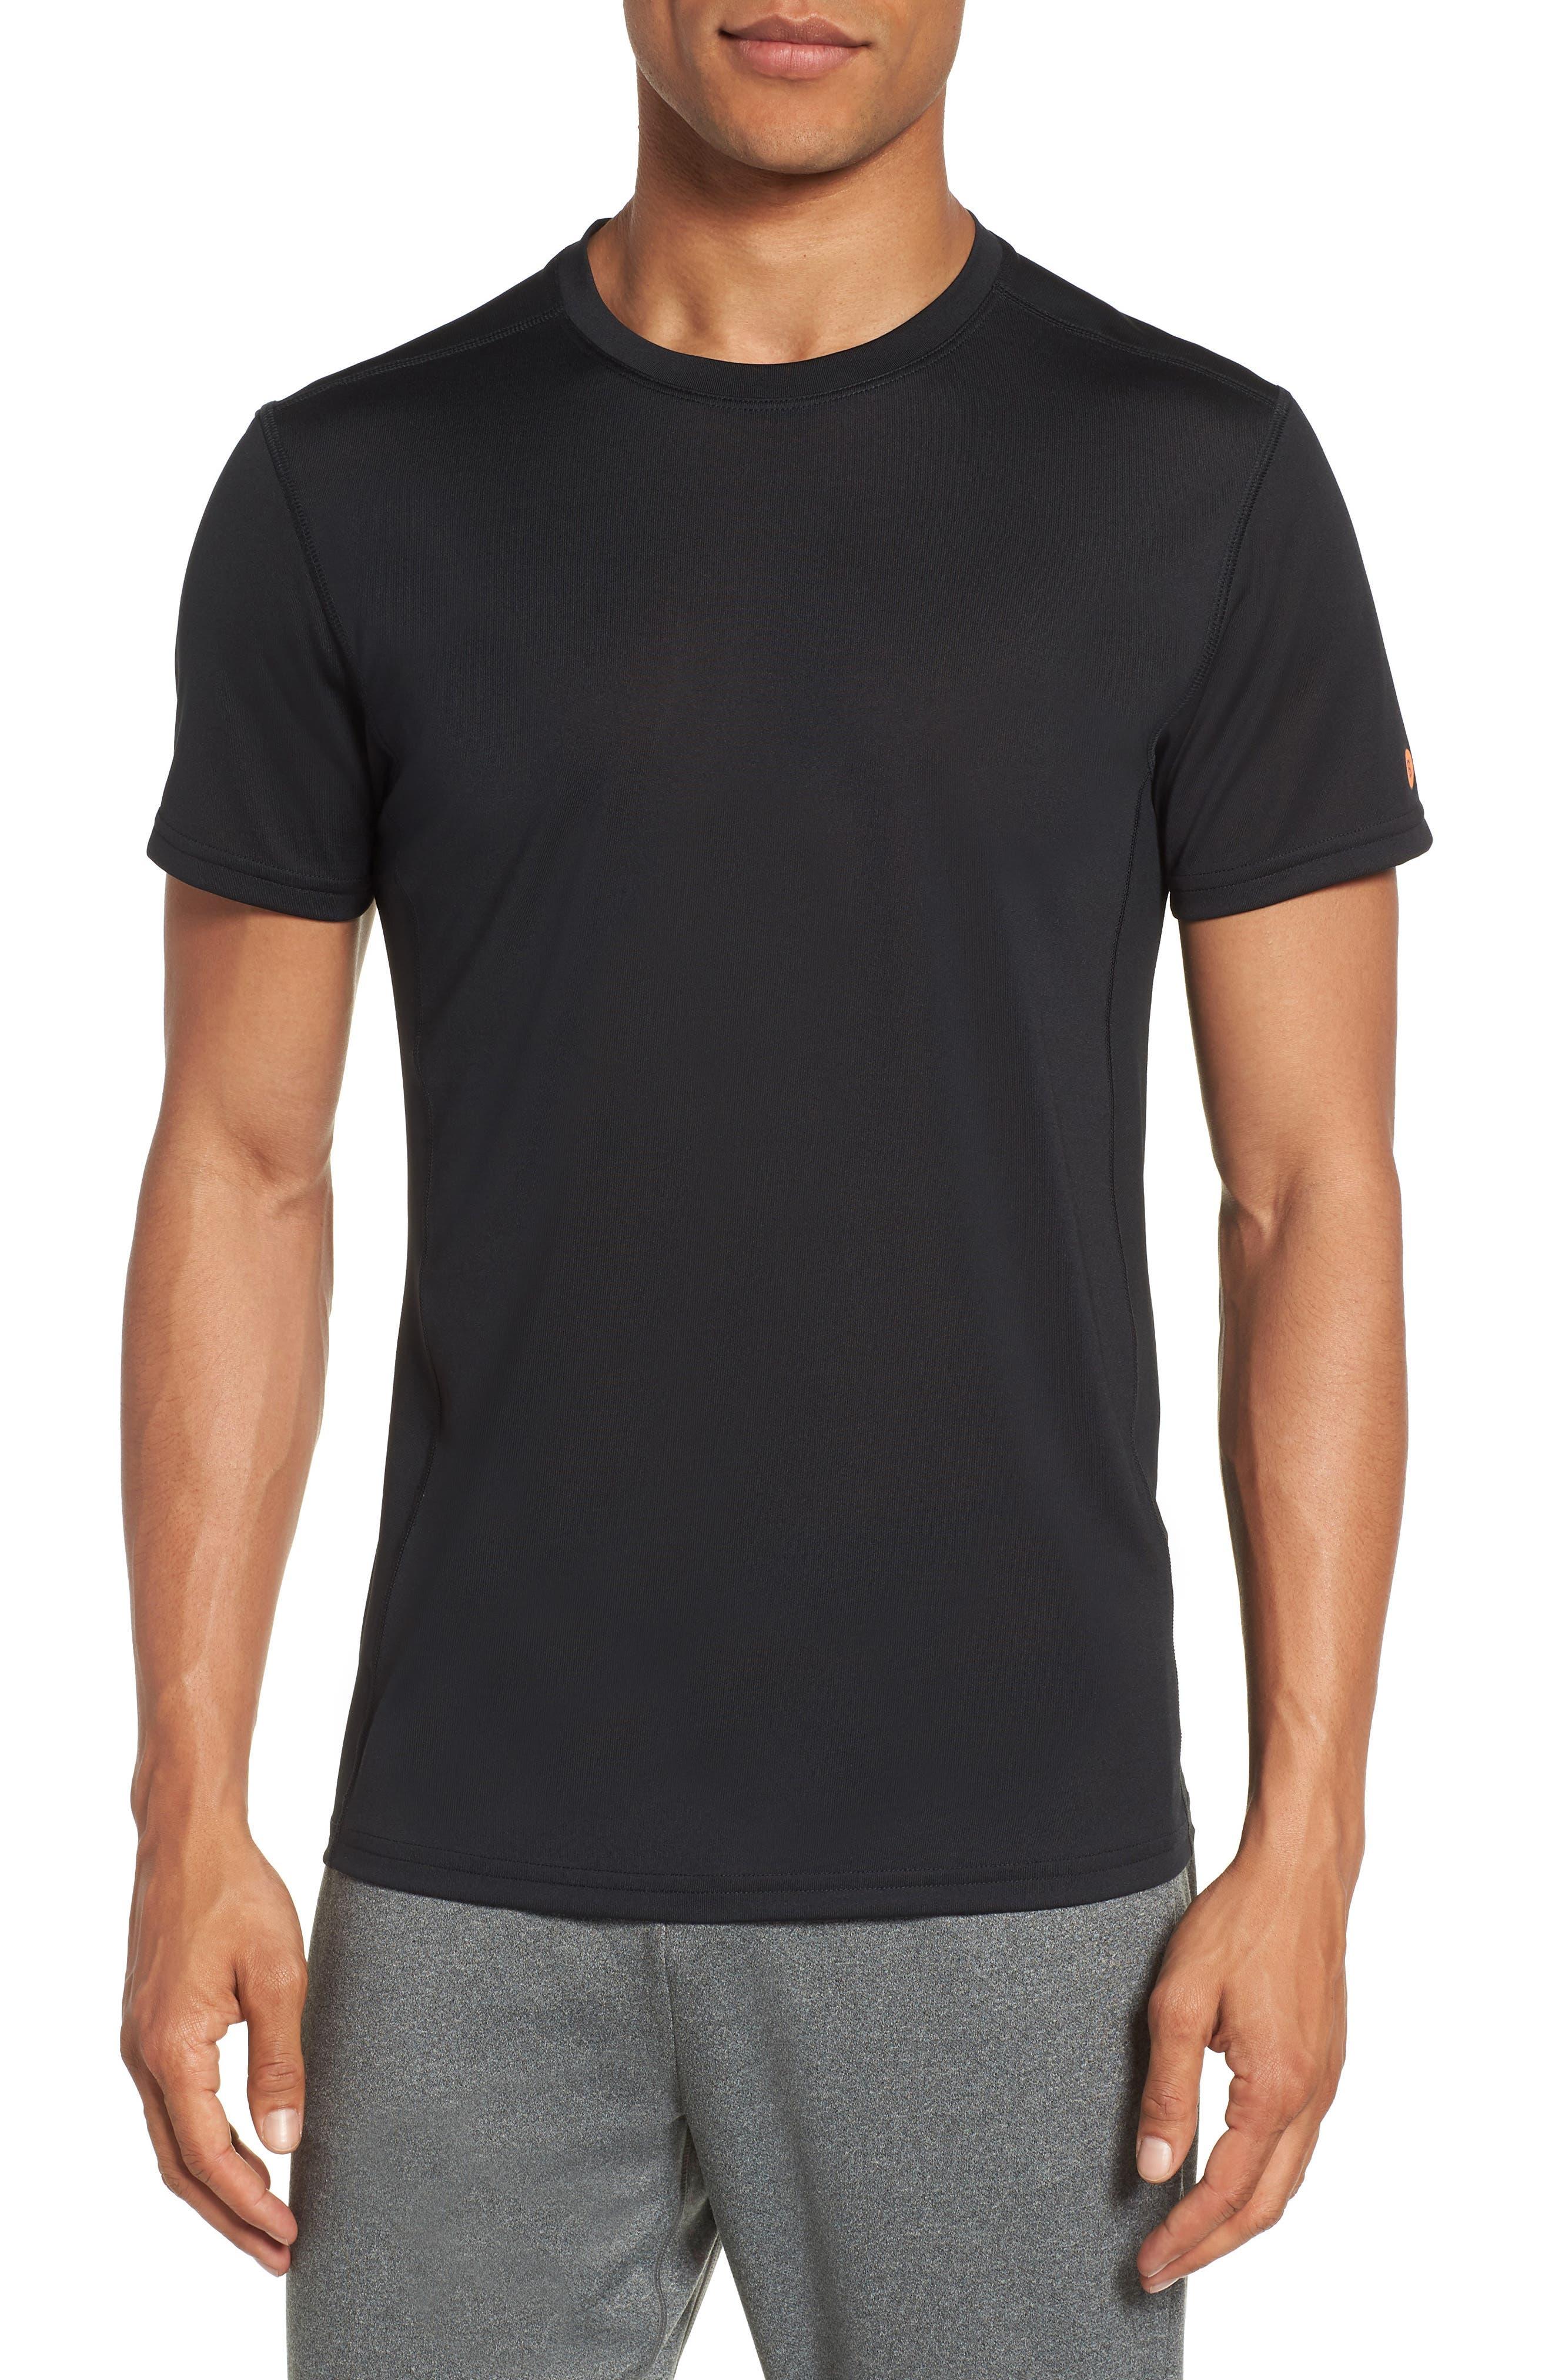 Goodsport Mesh Panel T-Shirt,                         Main,                         color, 001